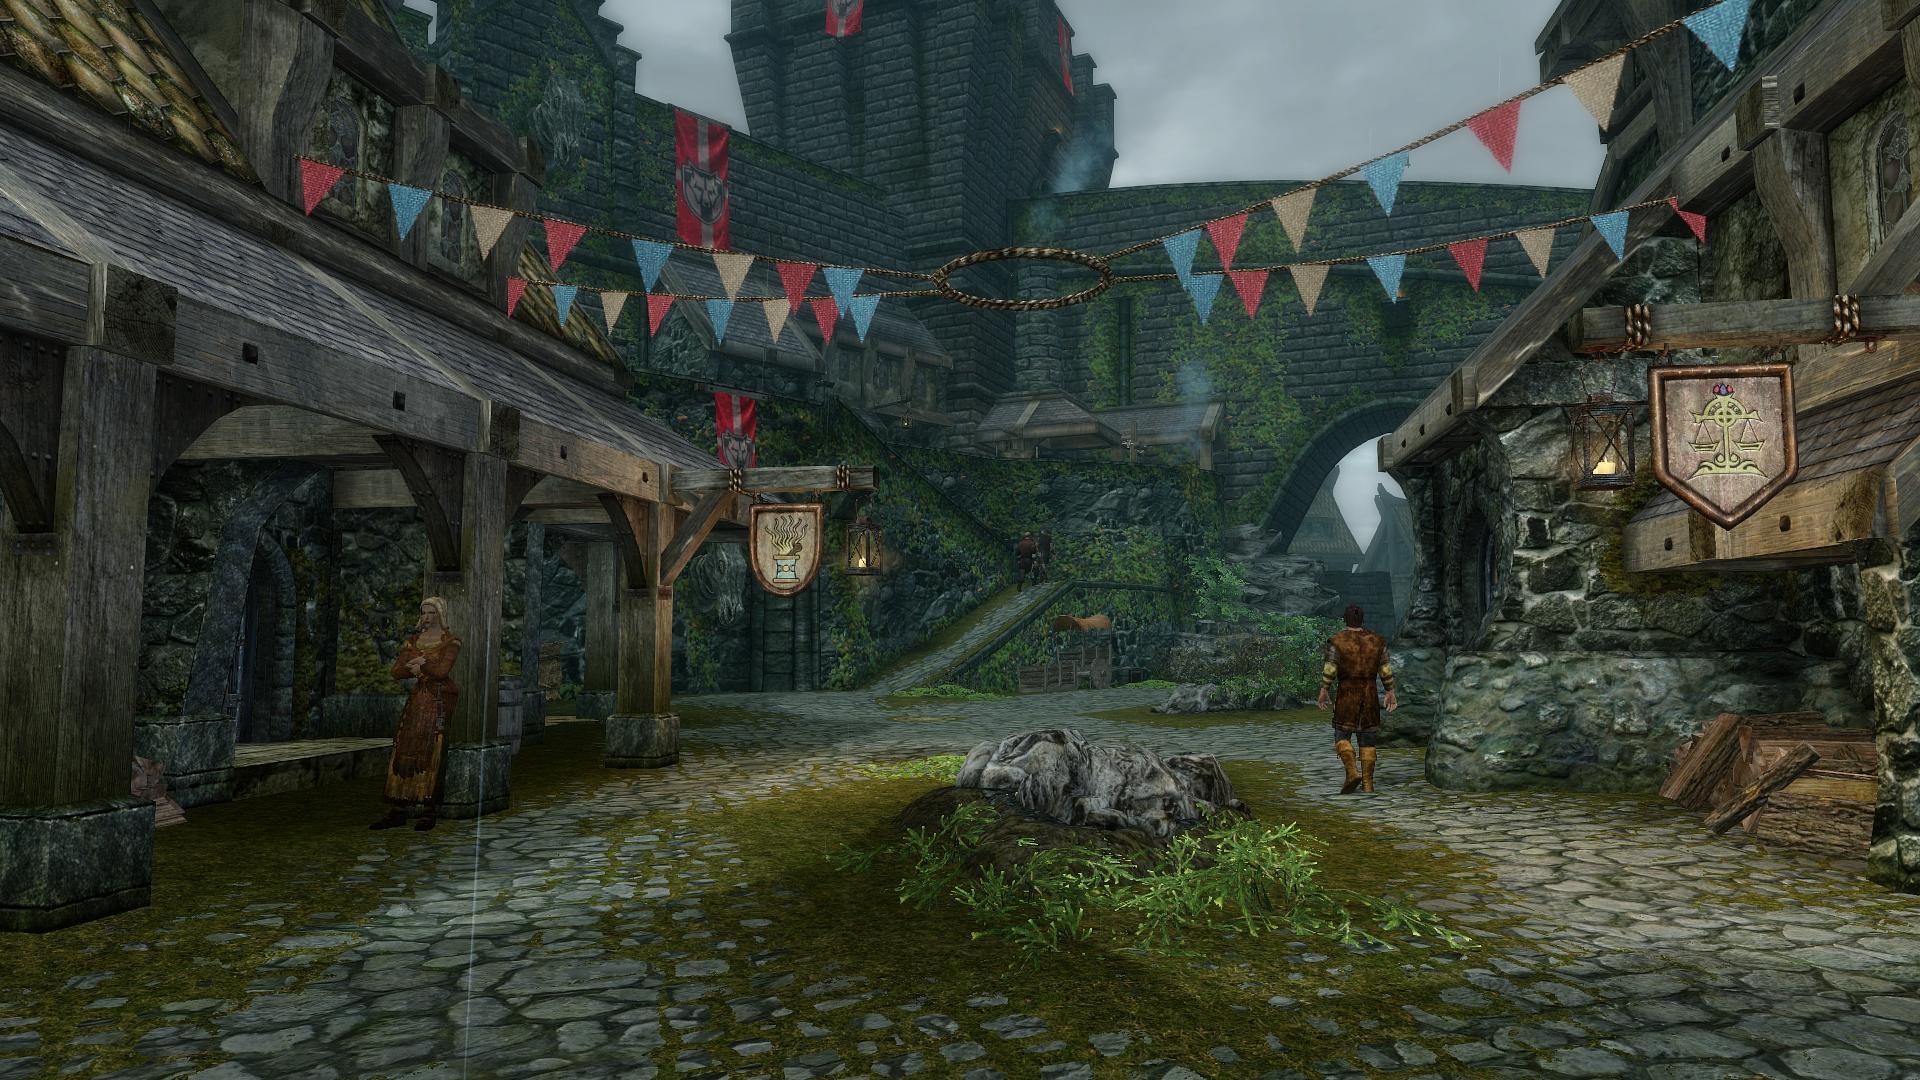 000192.Jpg - Elder Scrolls 5: Skyrim, the